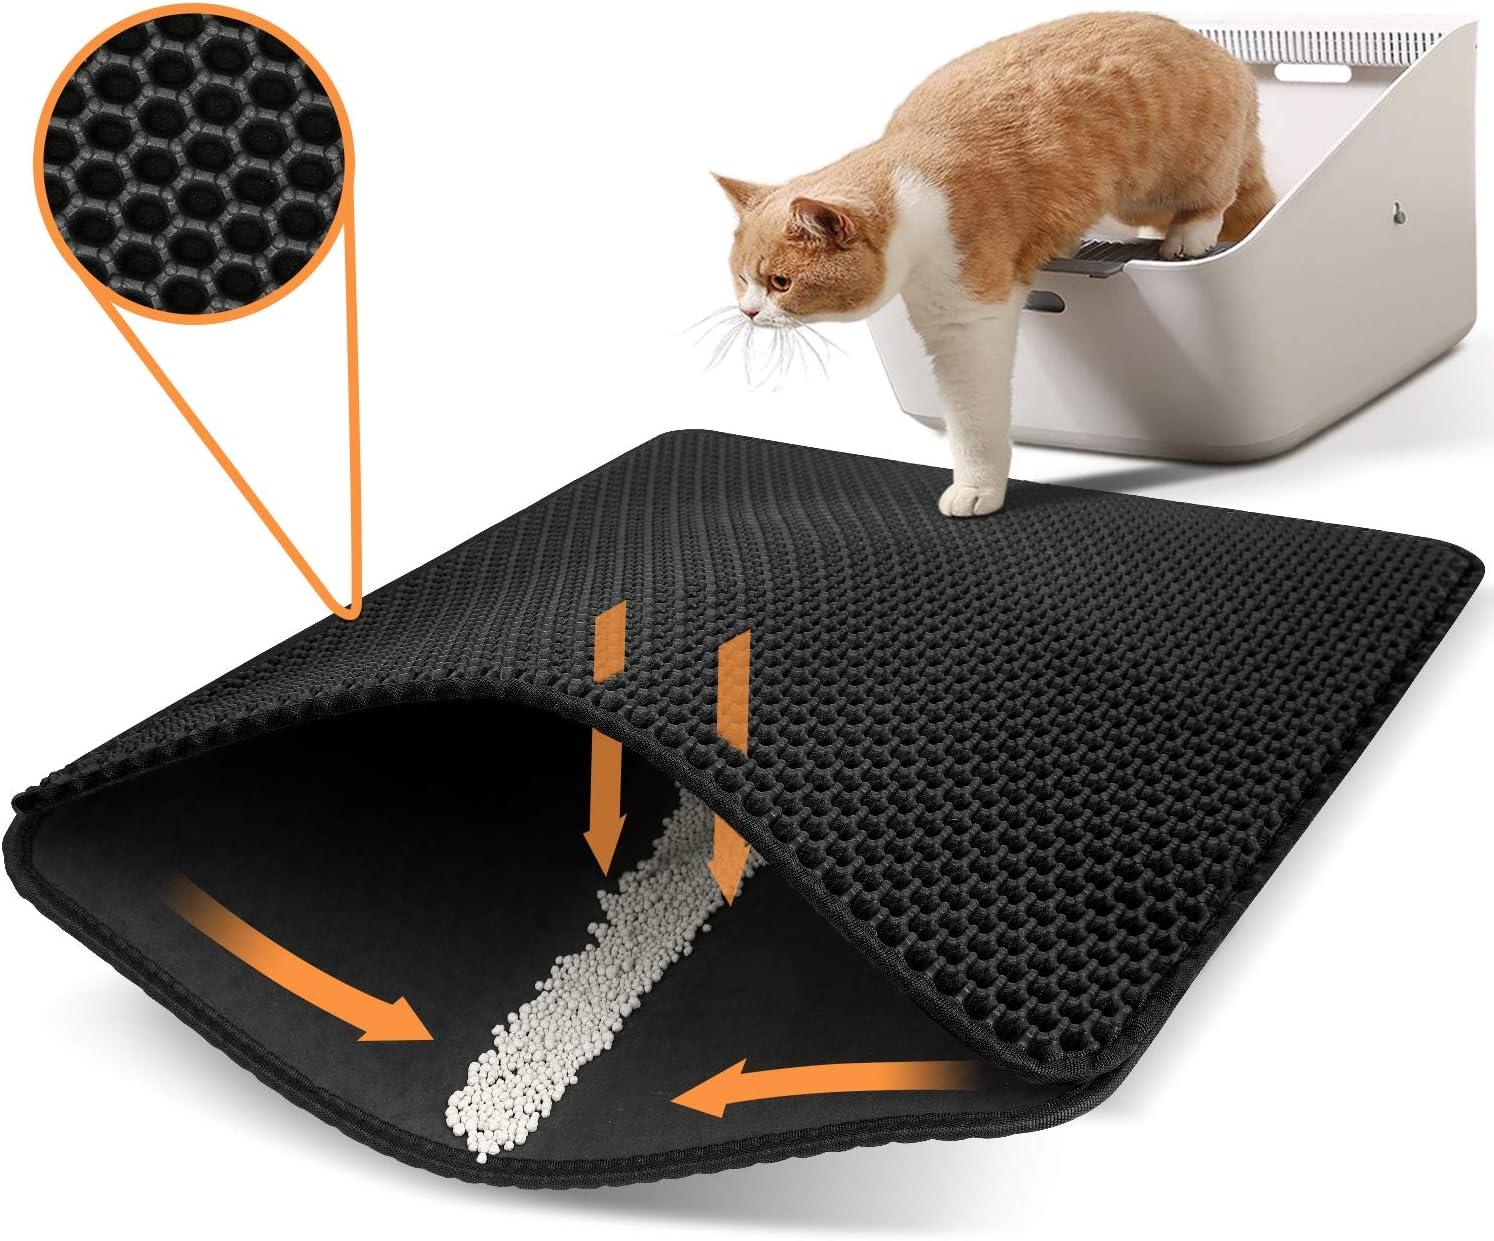 Polarduck Urine and Water Proof Double Layer Cat Litter Mat